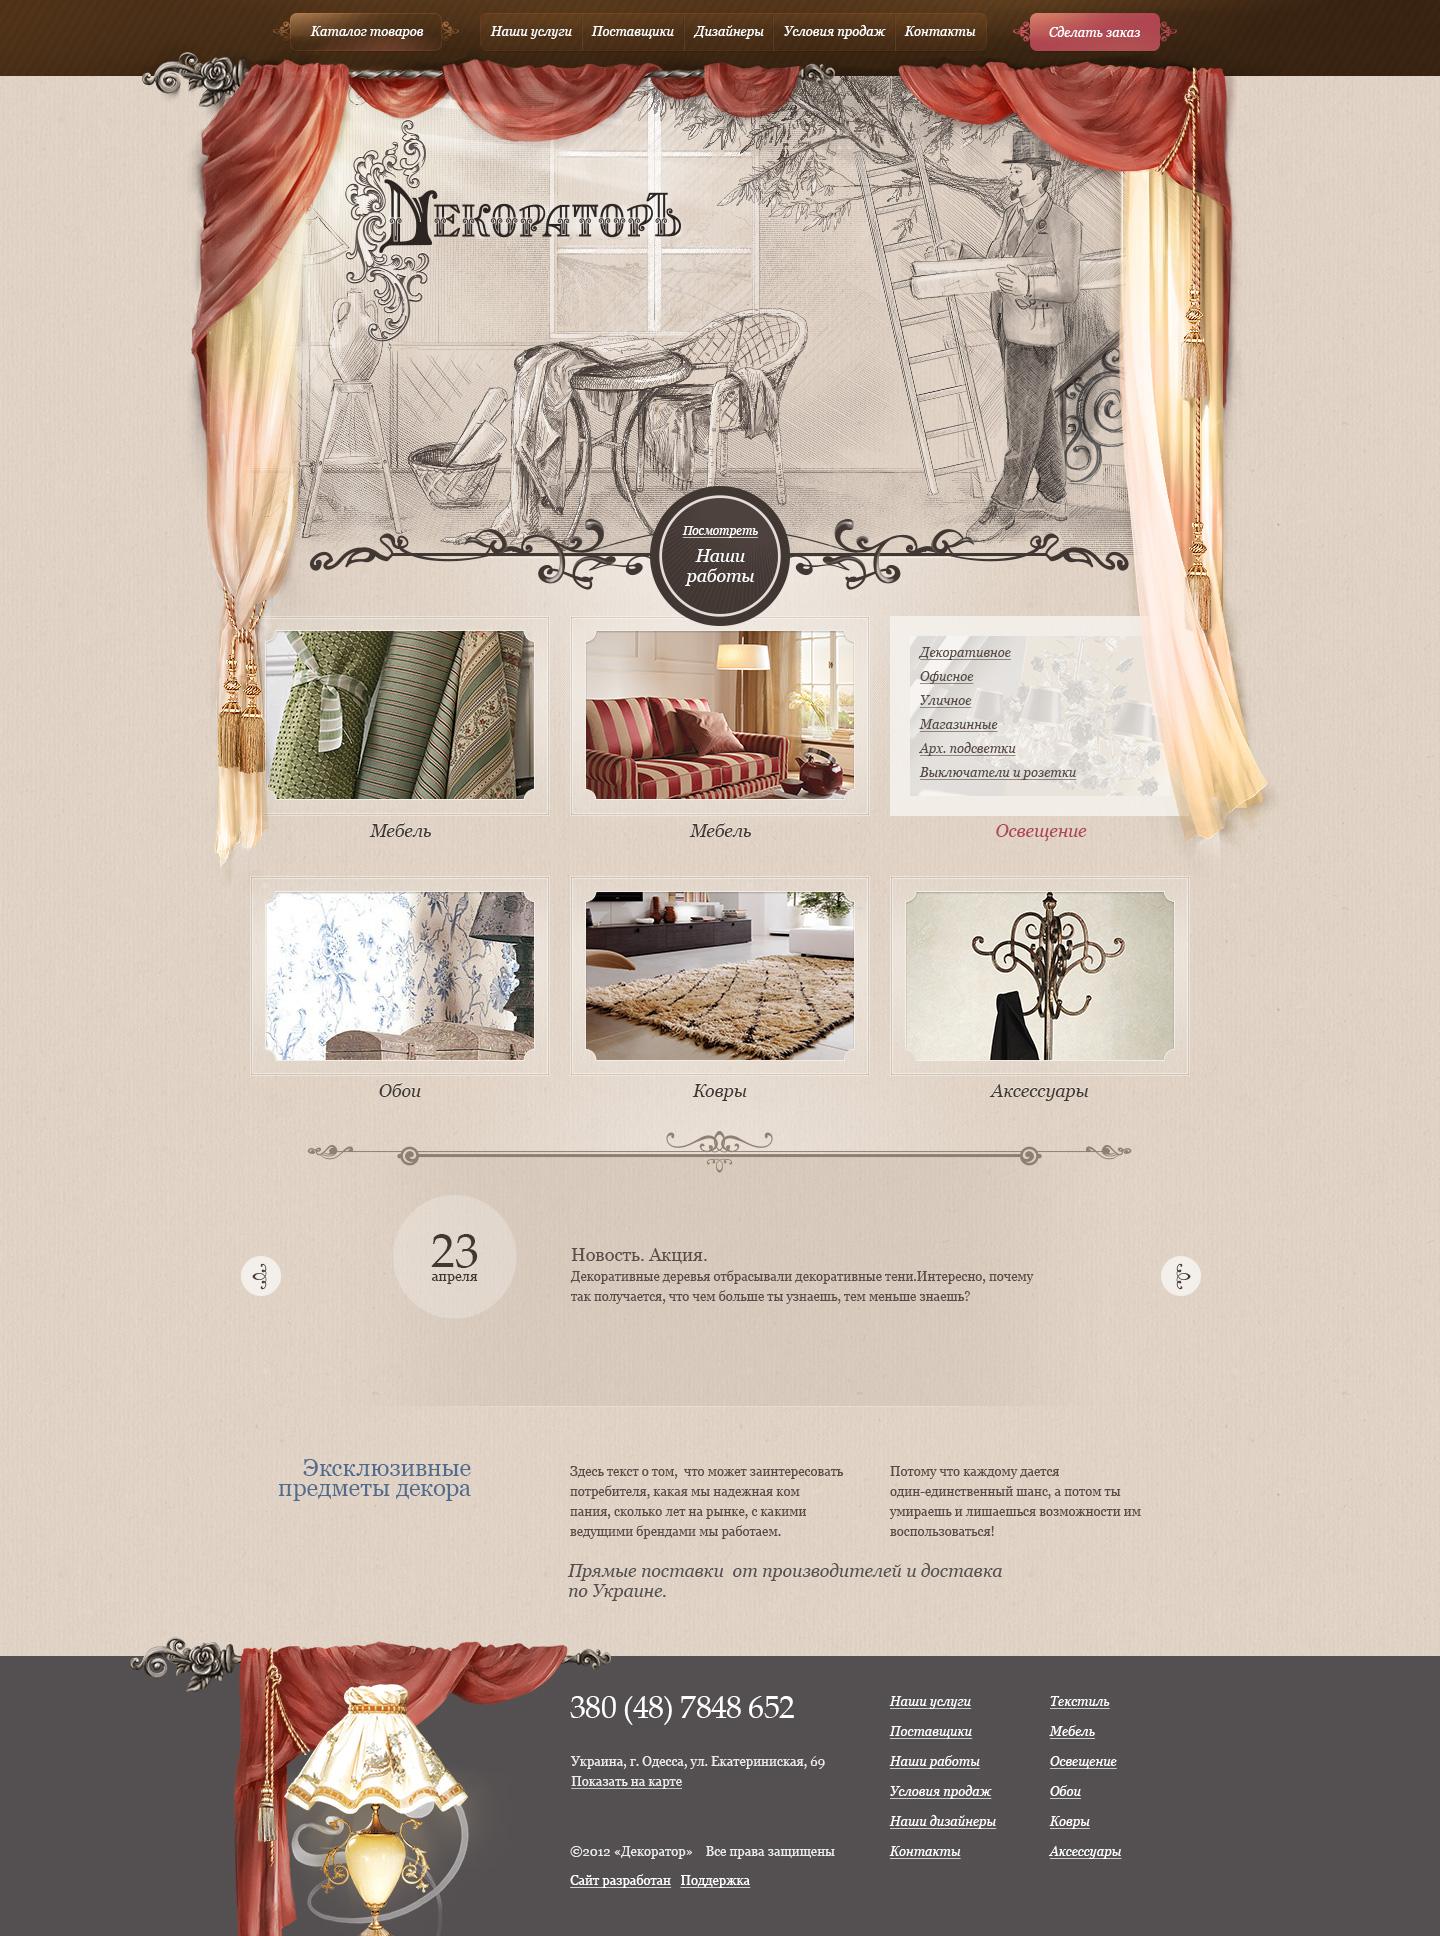 Decorator by art-designer